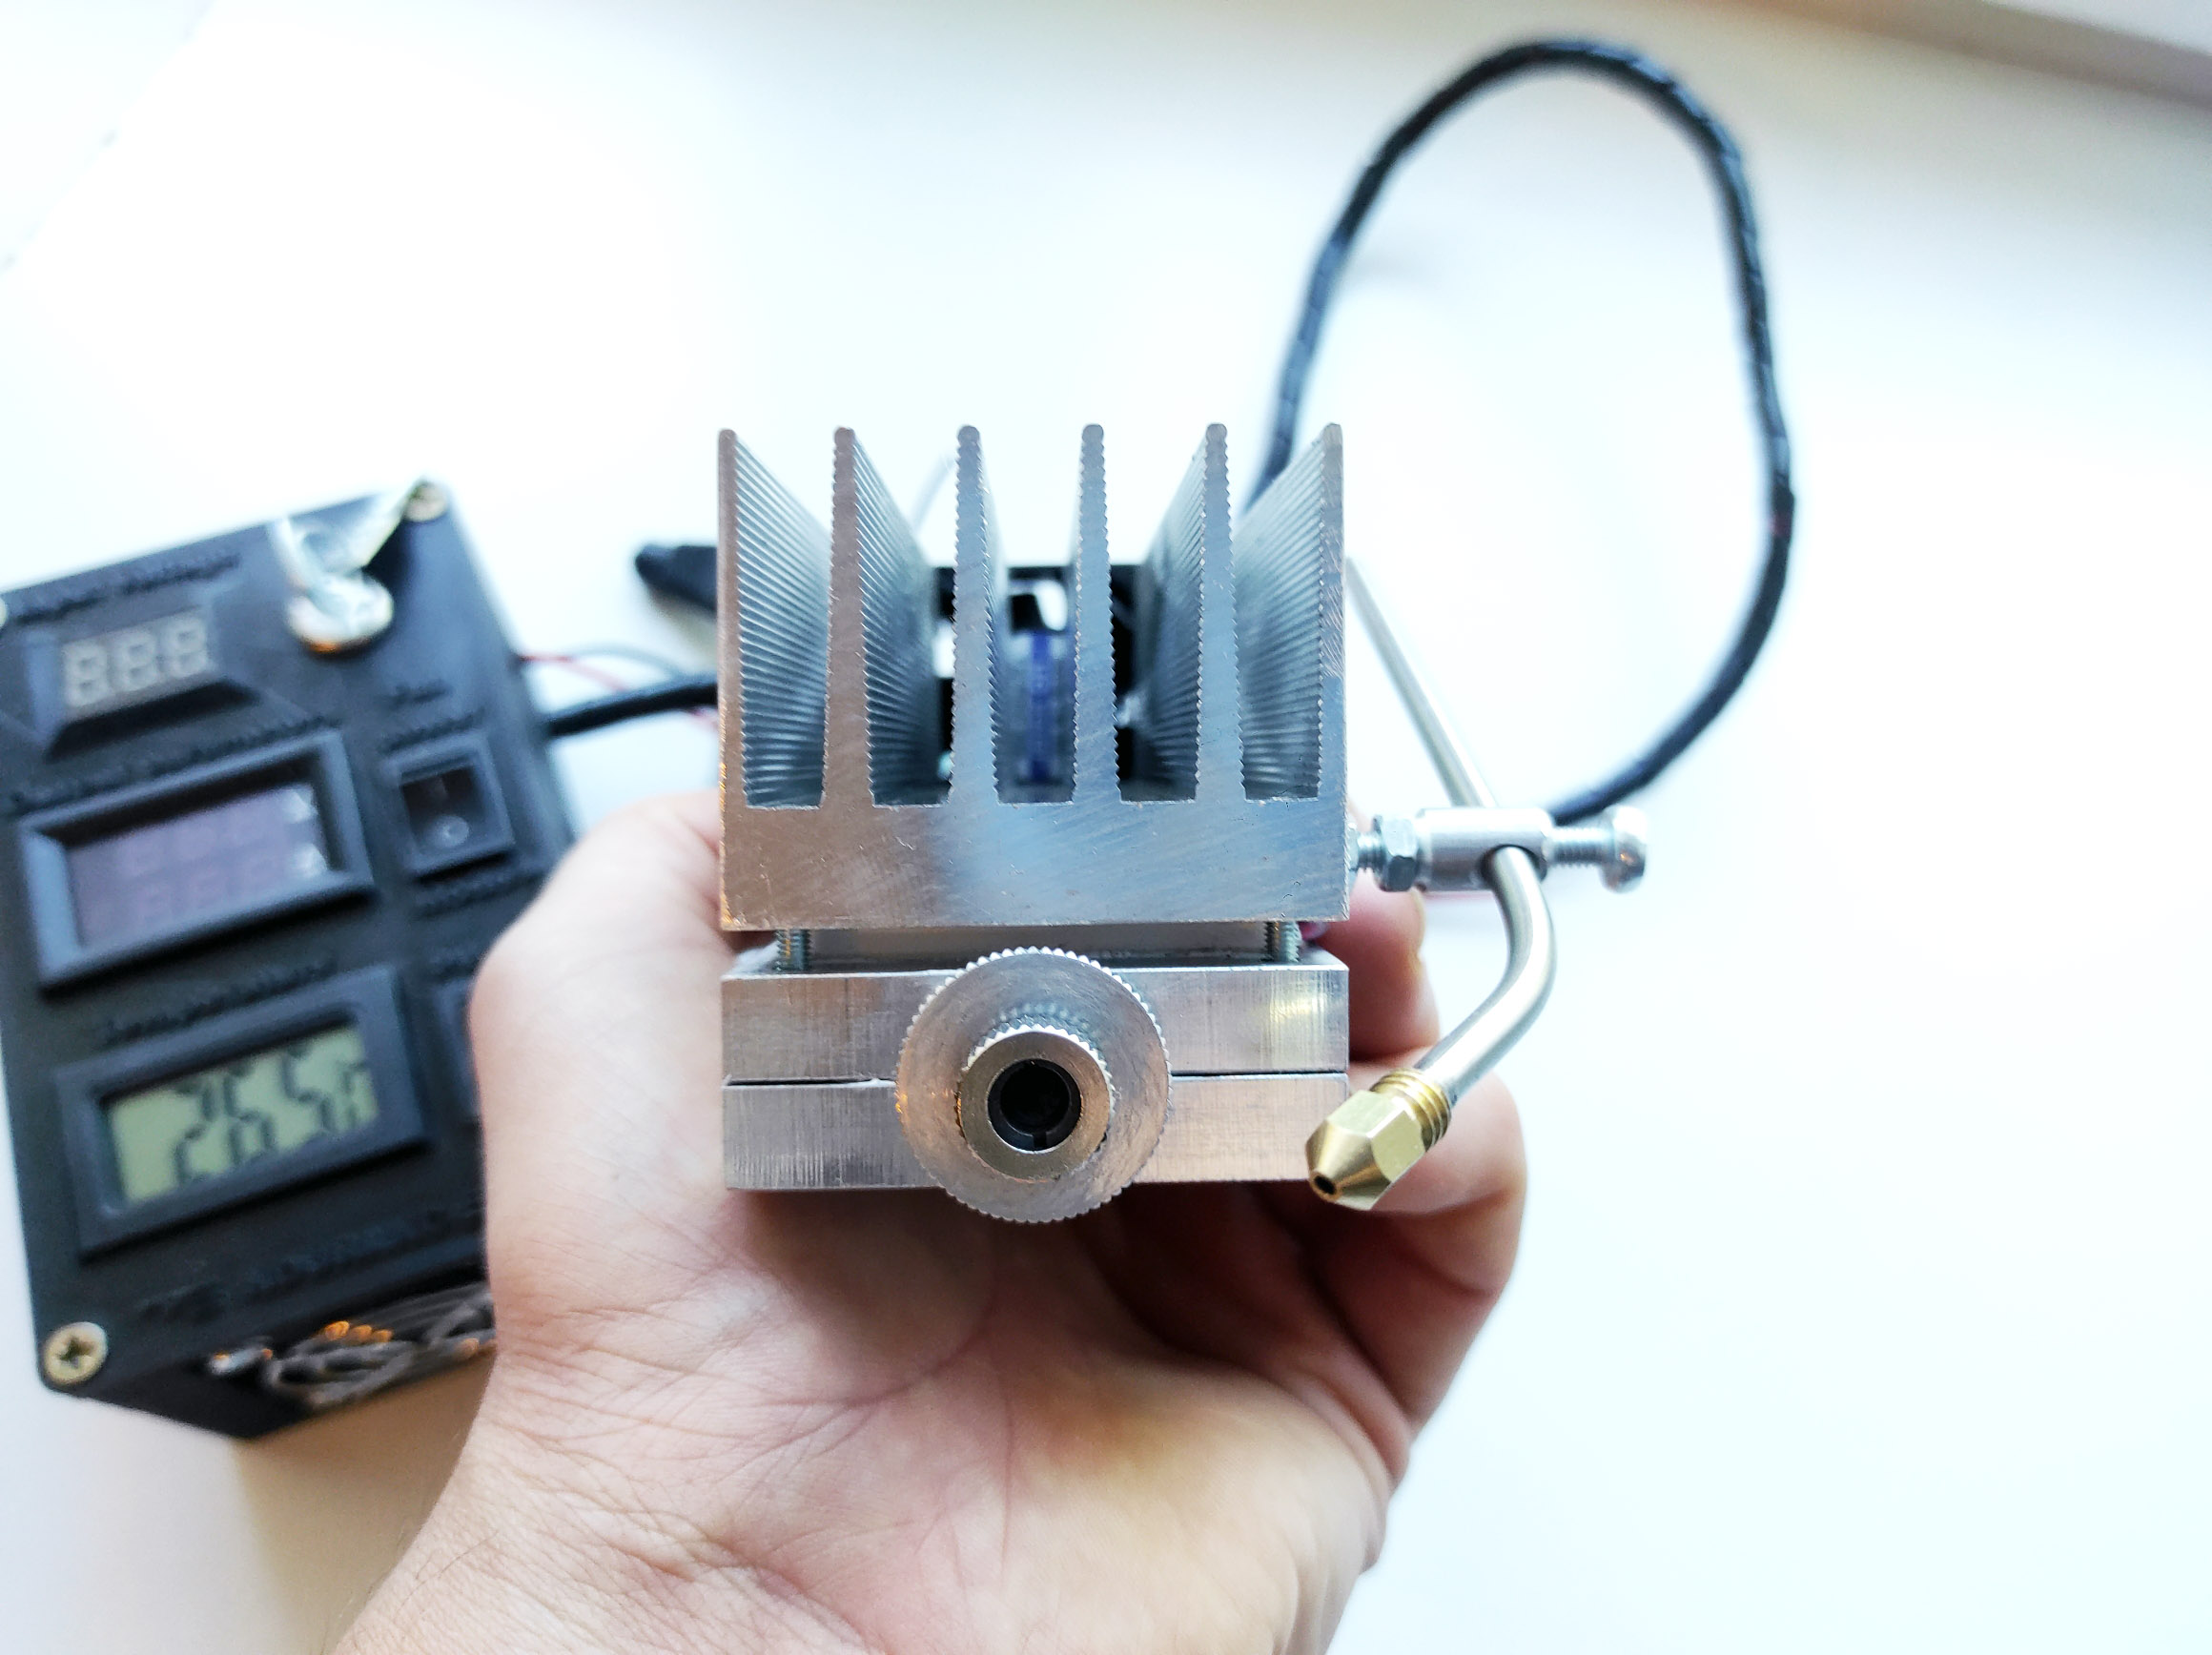 An Endurance 10 watt PLUS SE laser head